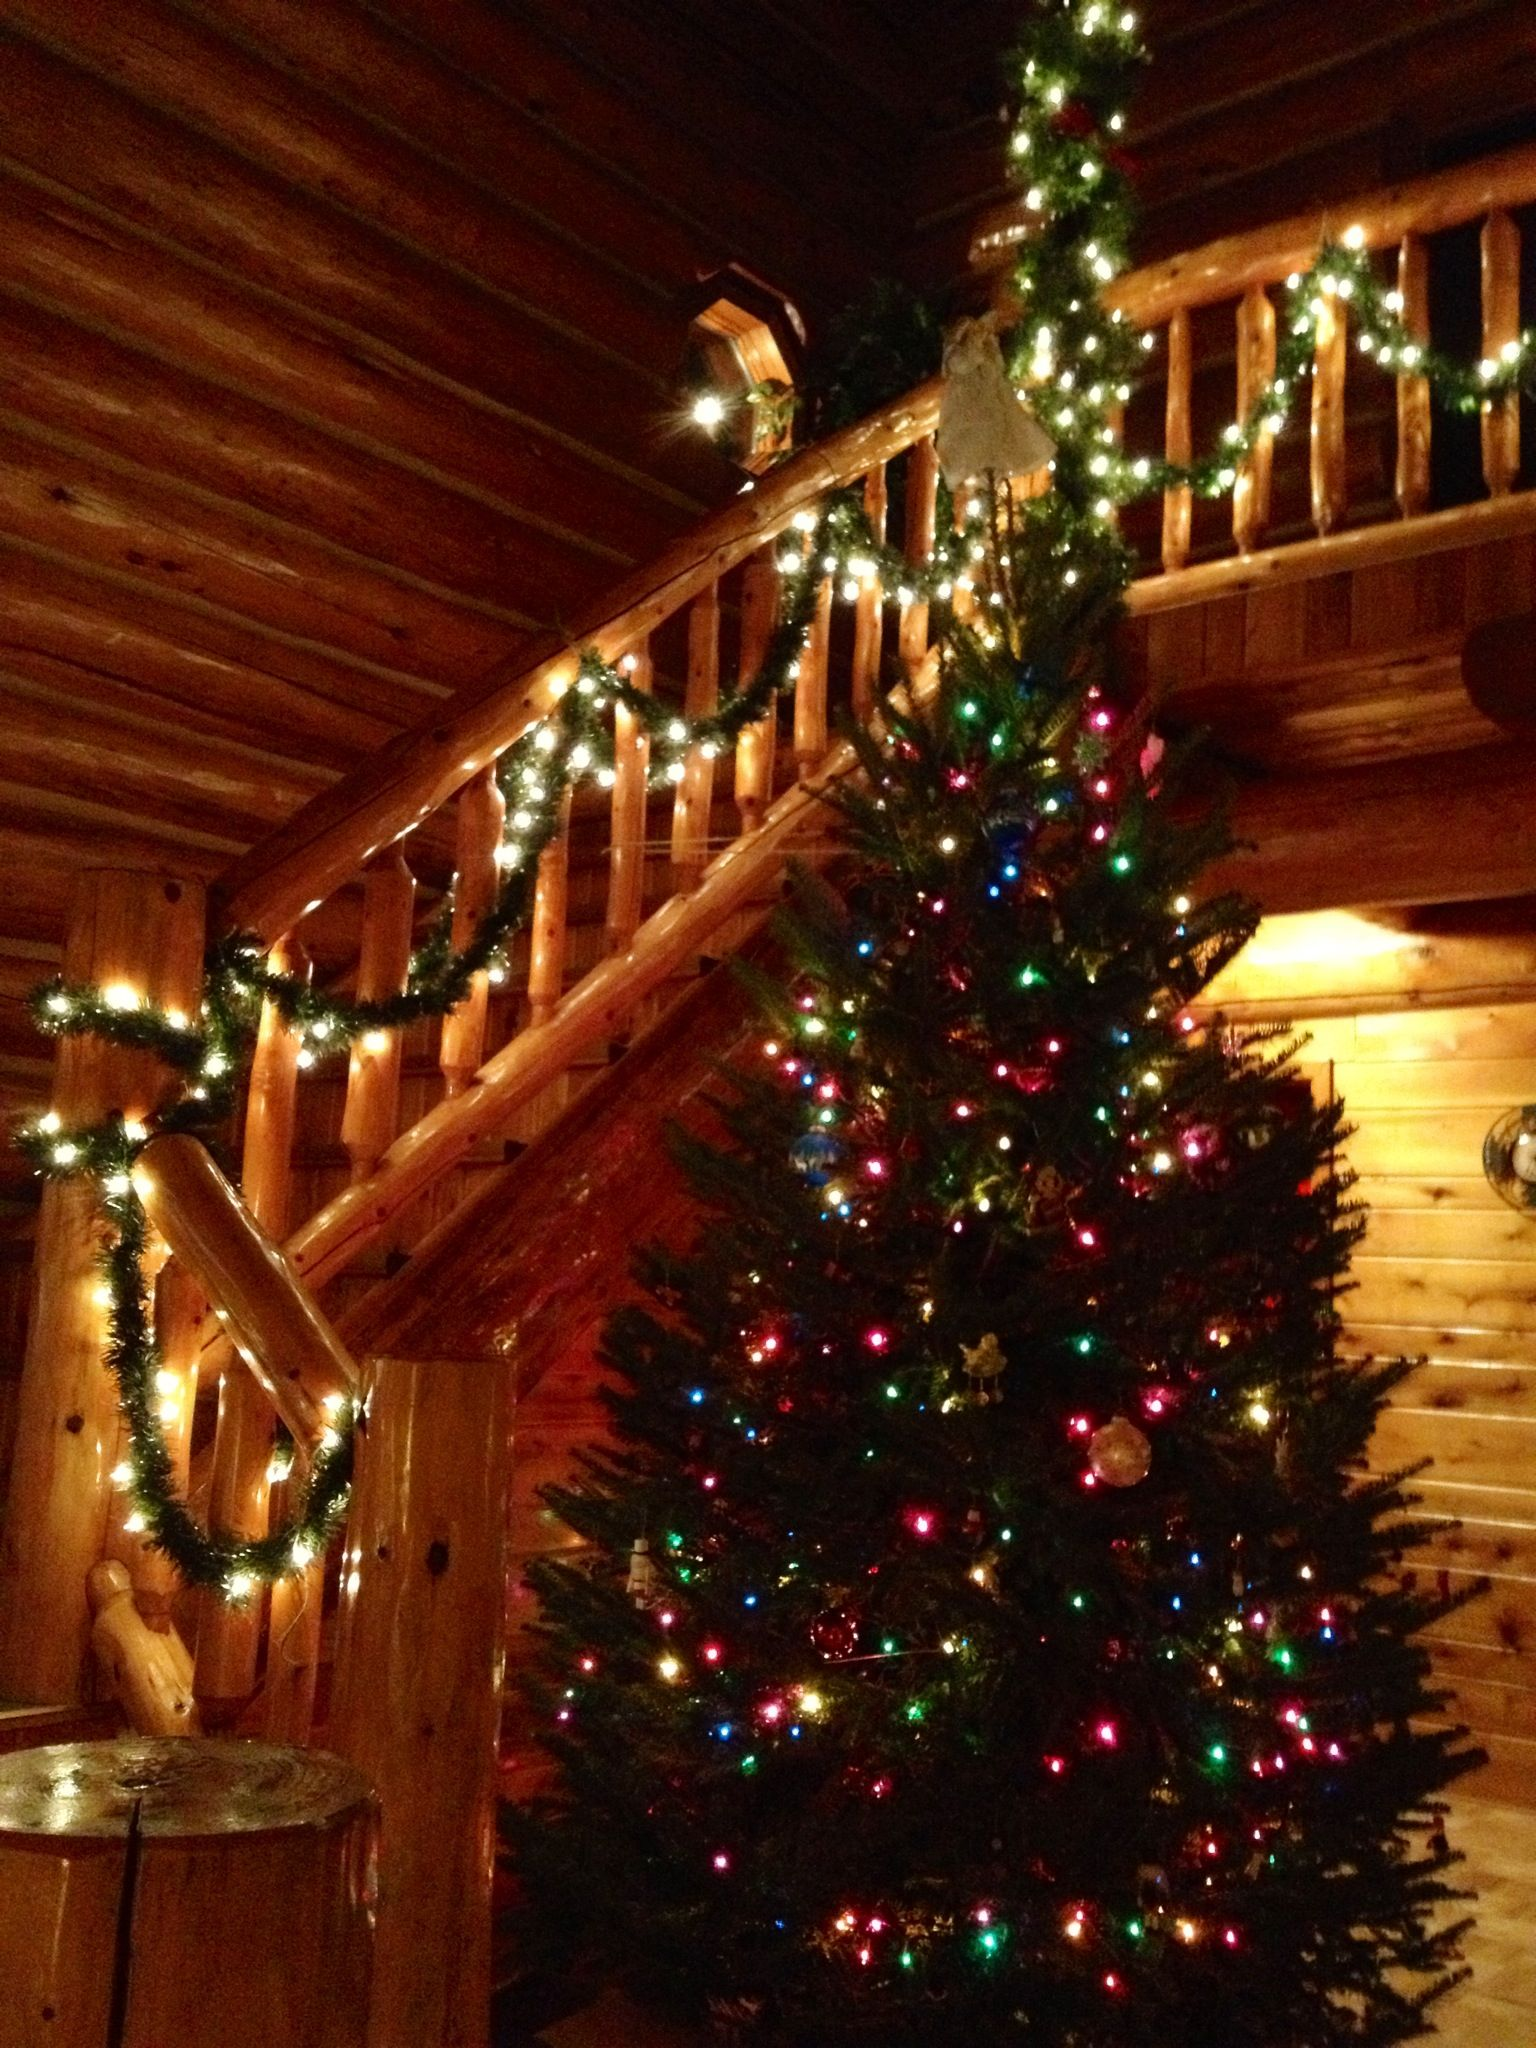 Christmas cabin interior - Log Cabin Christmas